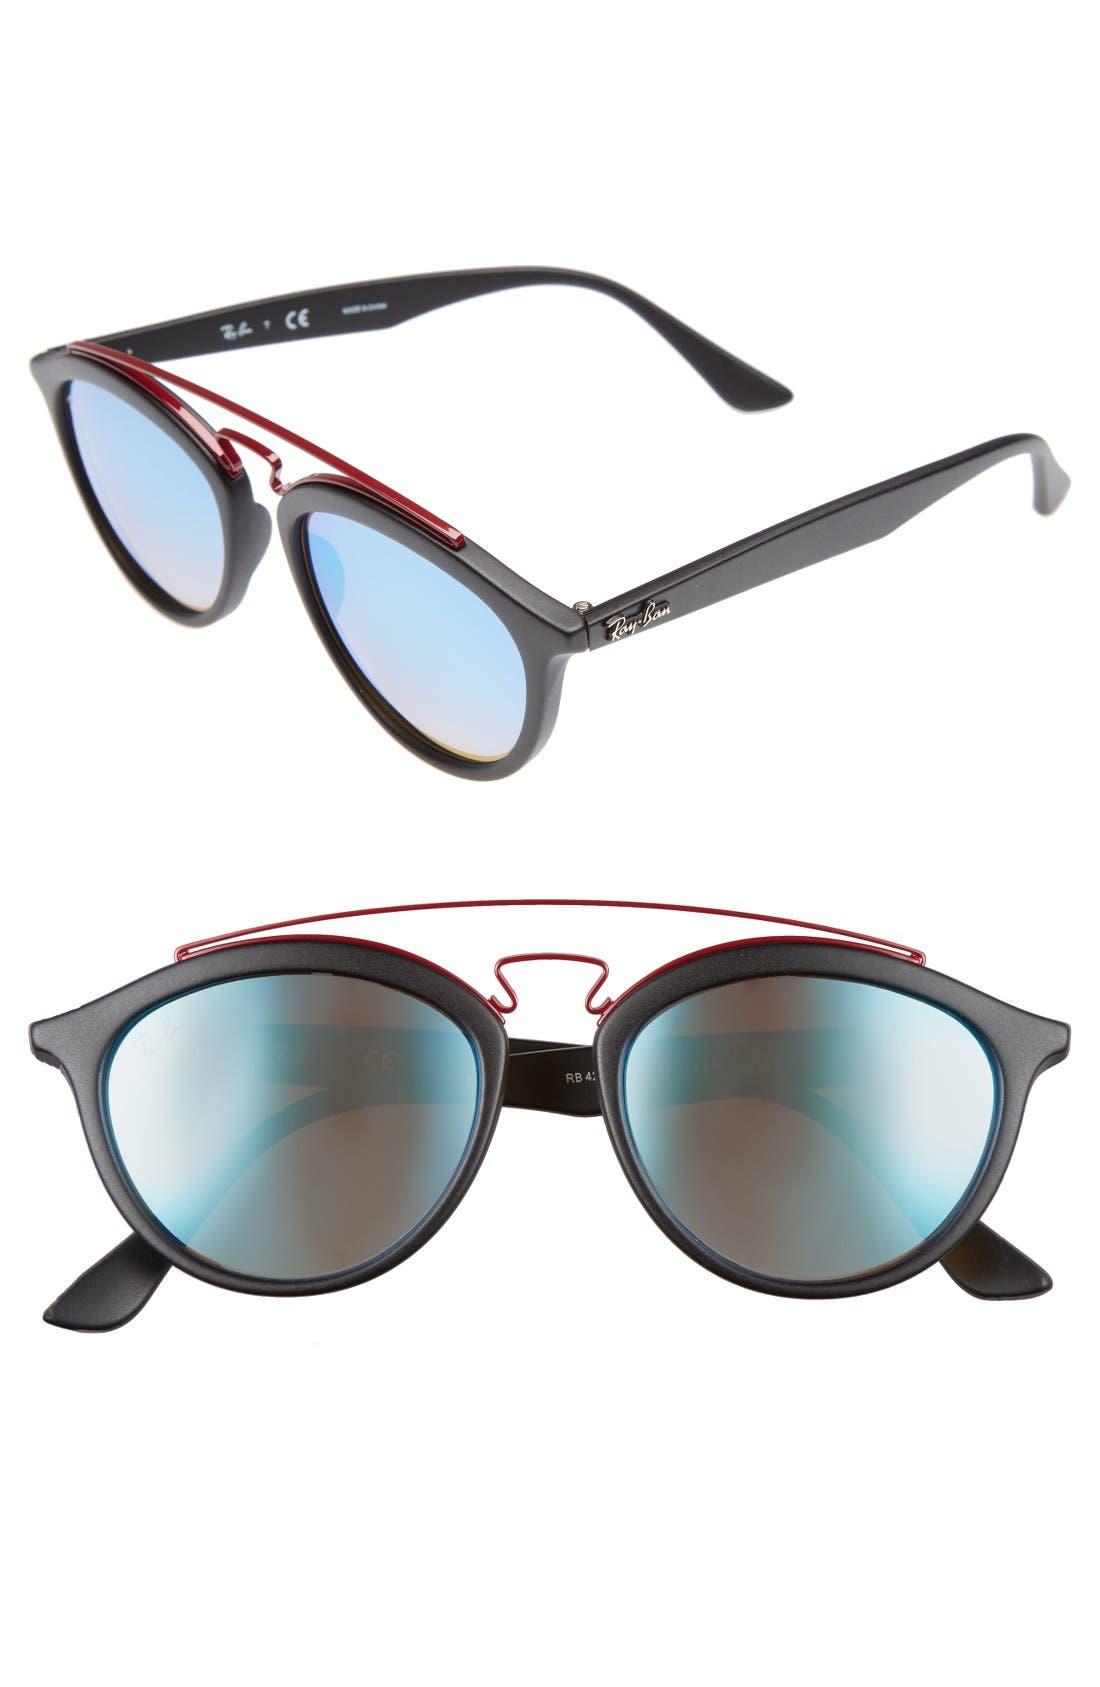 Icons 53mm Retro Sunglasses,                             Main thumbnail 1, color,                             Black/ Blue